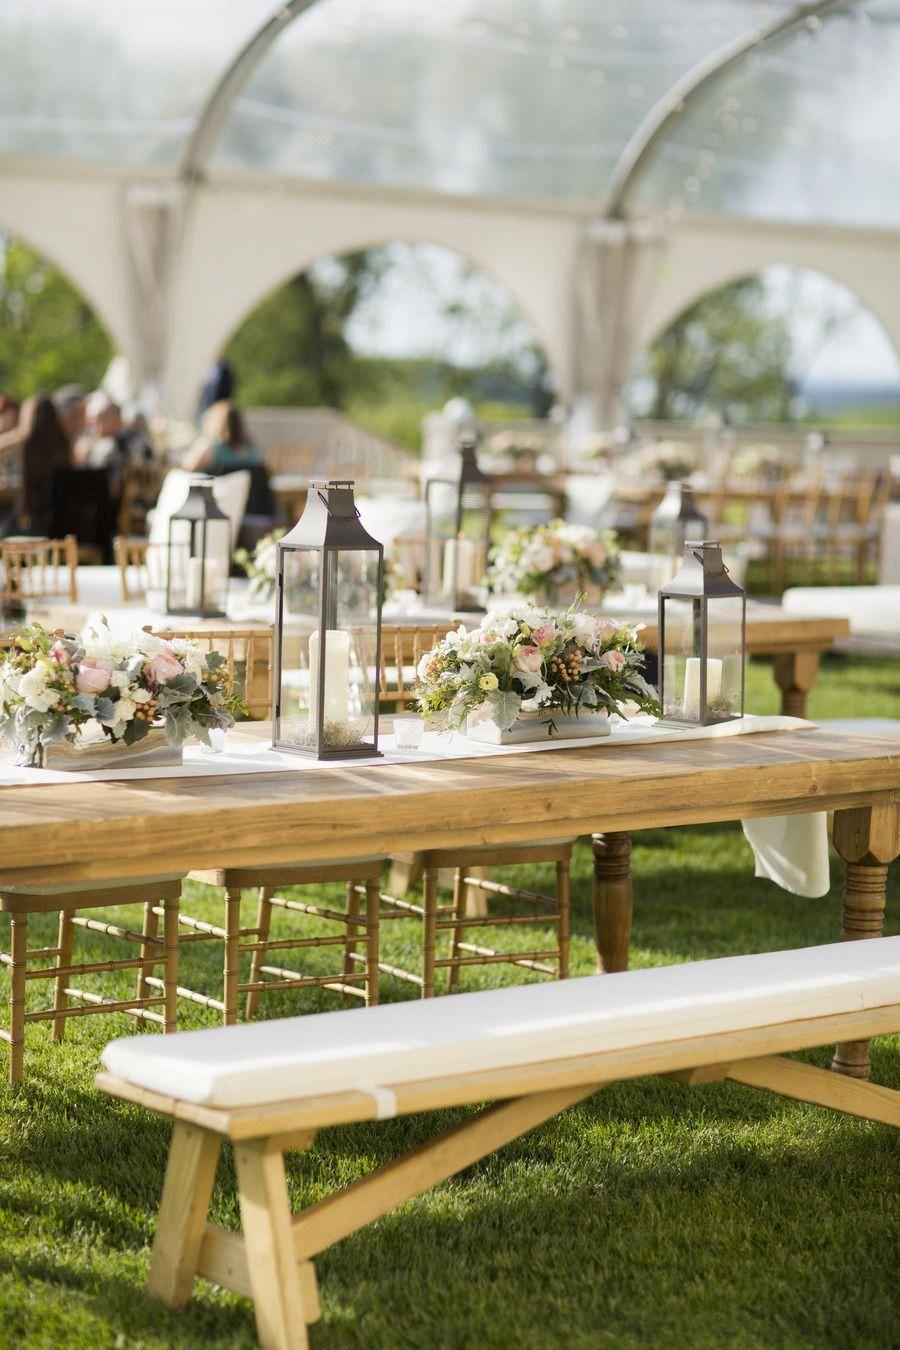 Pin on Sunken Gardens Weddings